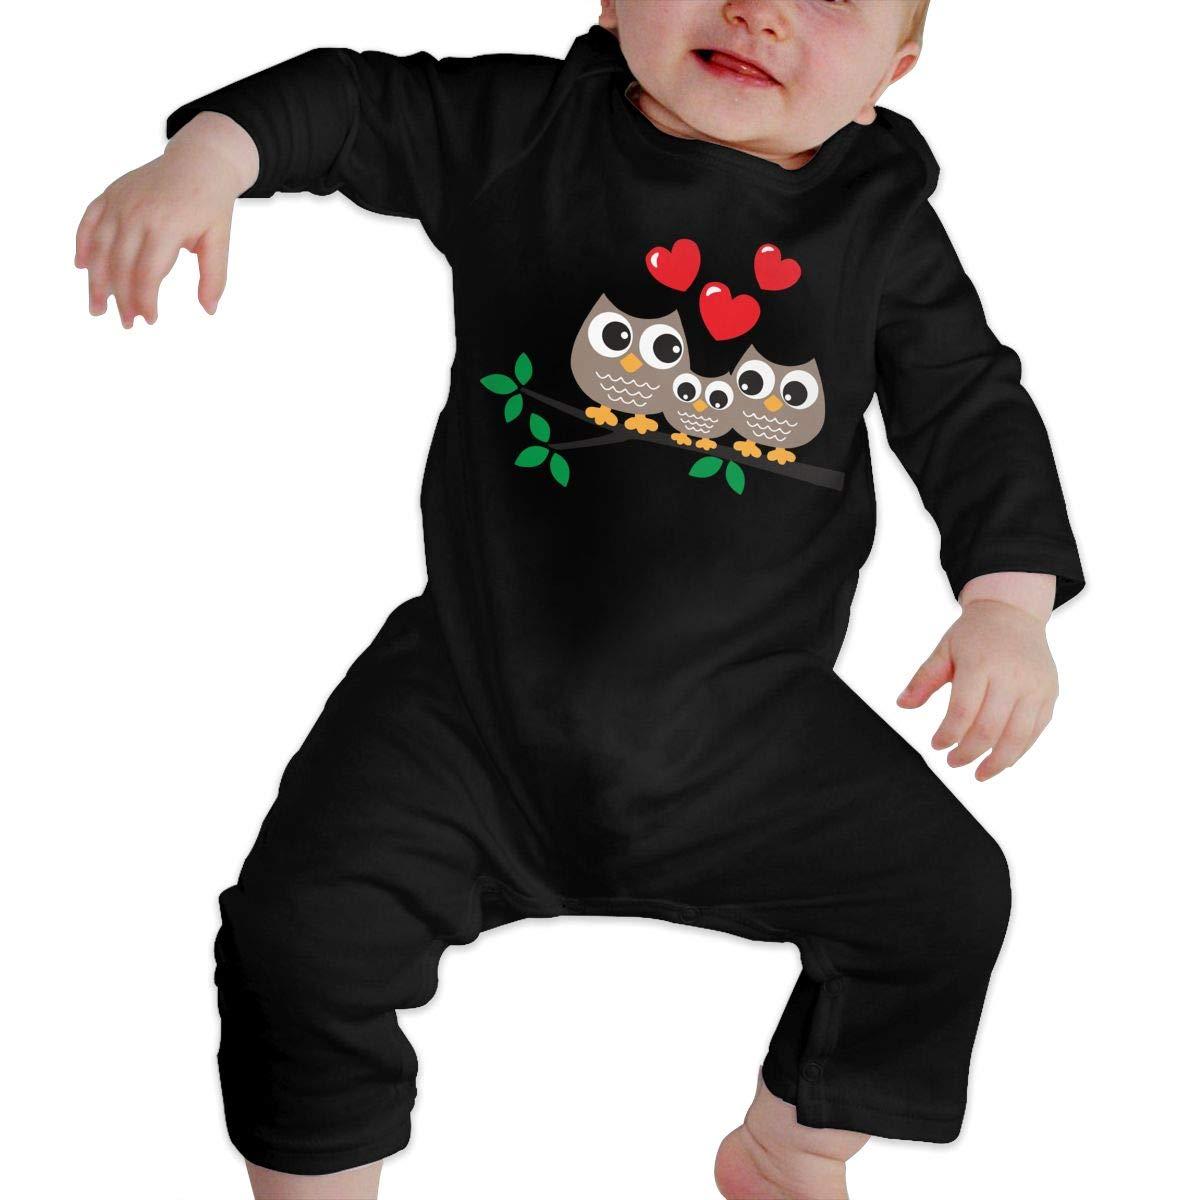 Adorable Green Pistachio in Shell Cartoon Baby Boy Long Sleeve Bodysuit Toddler Jumpsuit